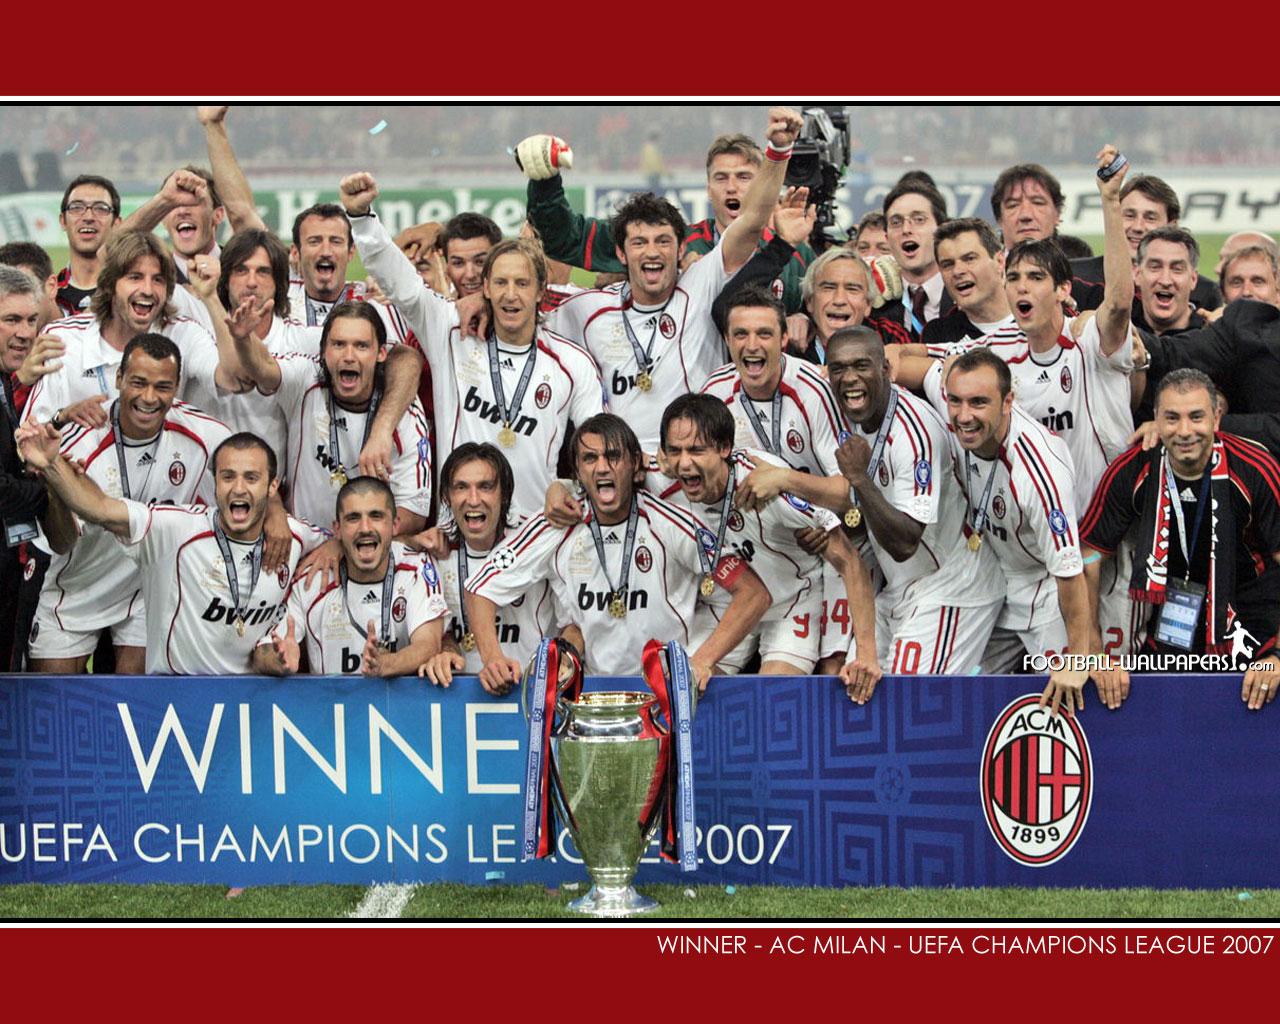 Alvian dikha : the winner champions 1955 - 2013 ( photos )1280 x 1024